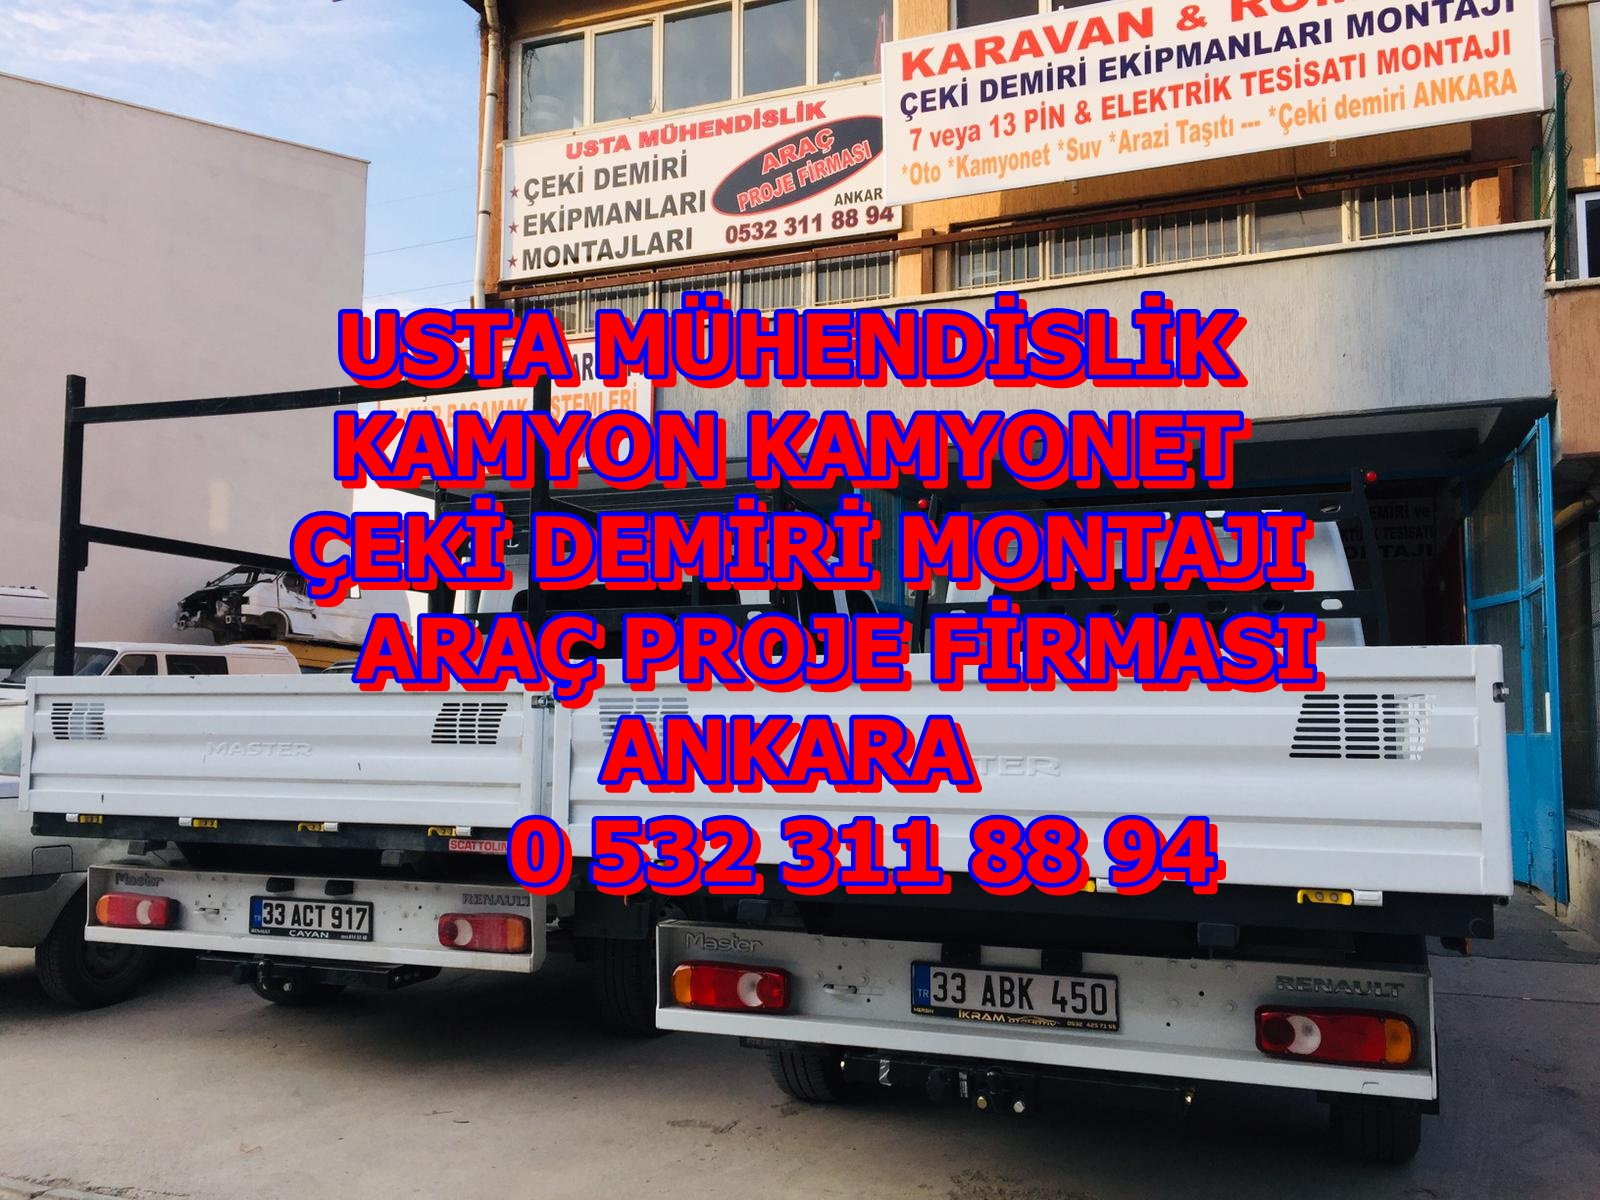 KAMYON KAMYONET ÇEKİ DEMİRİ ANKARA USTA MÜHENDİSLİK 035